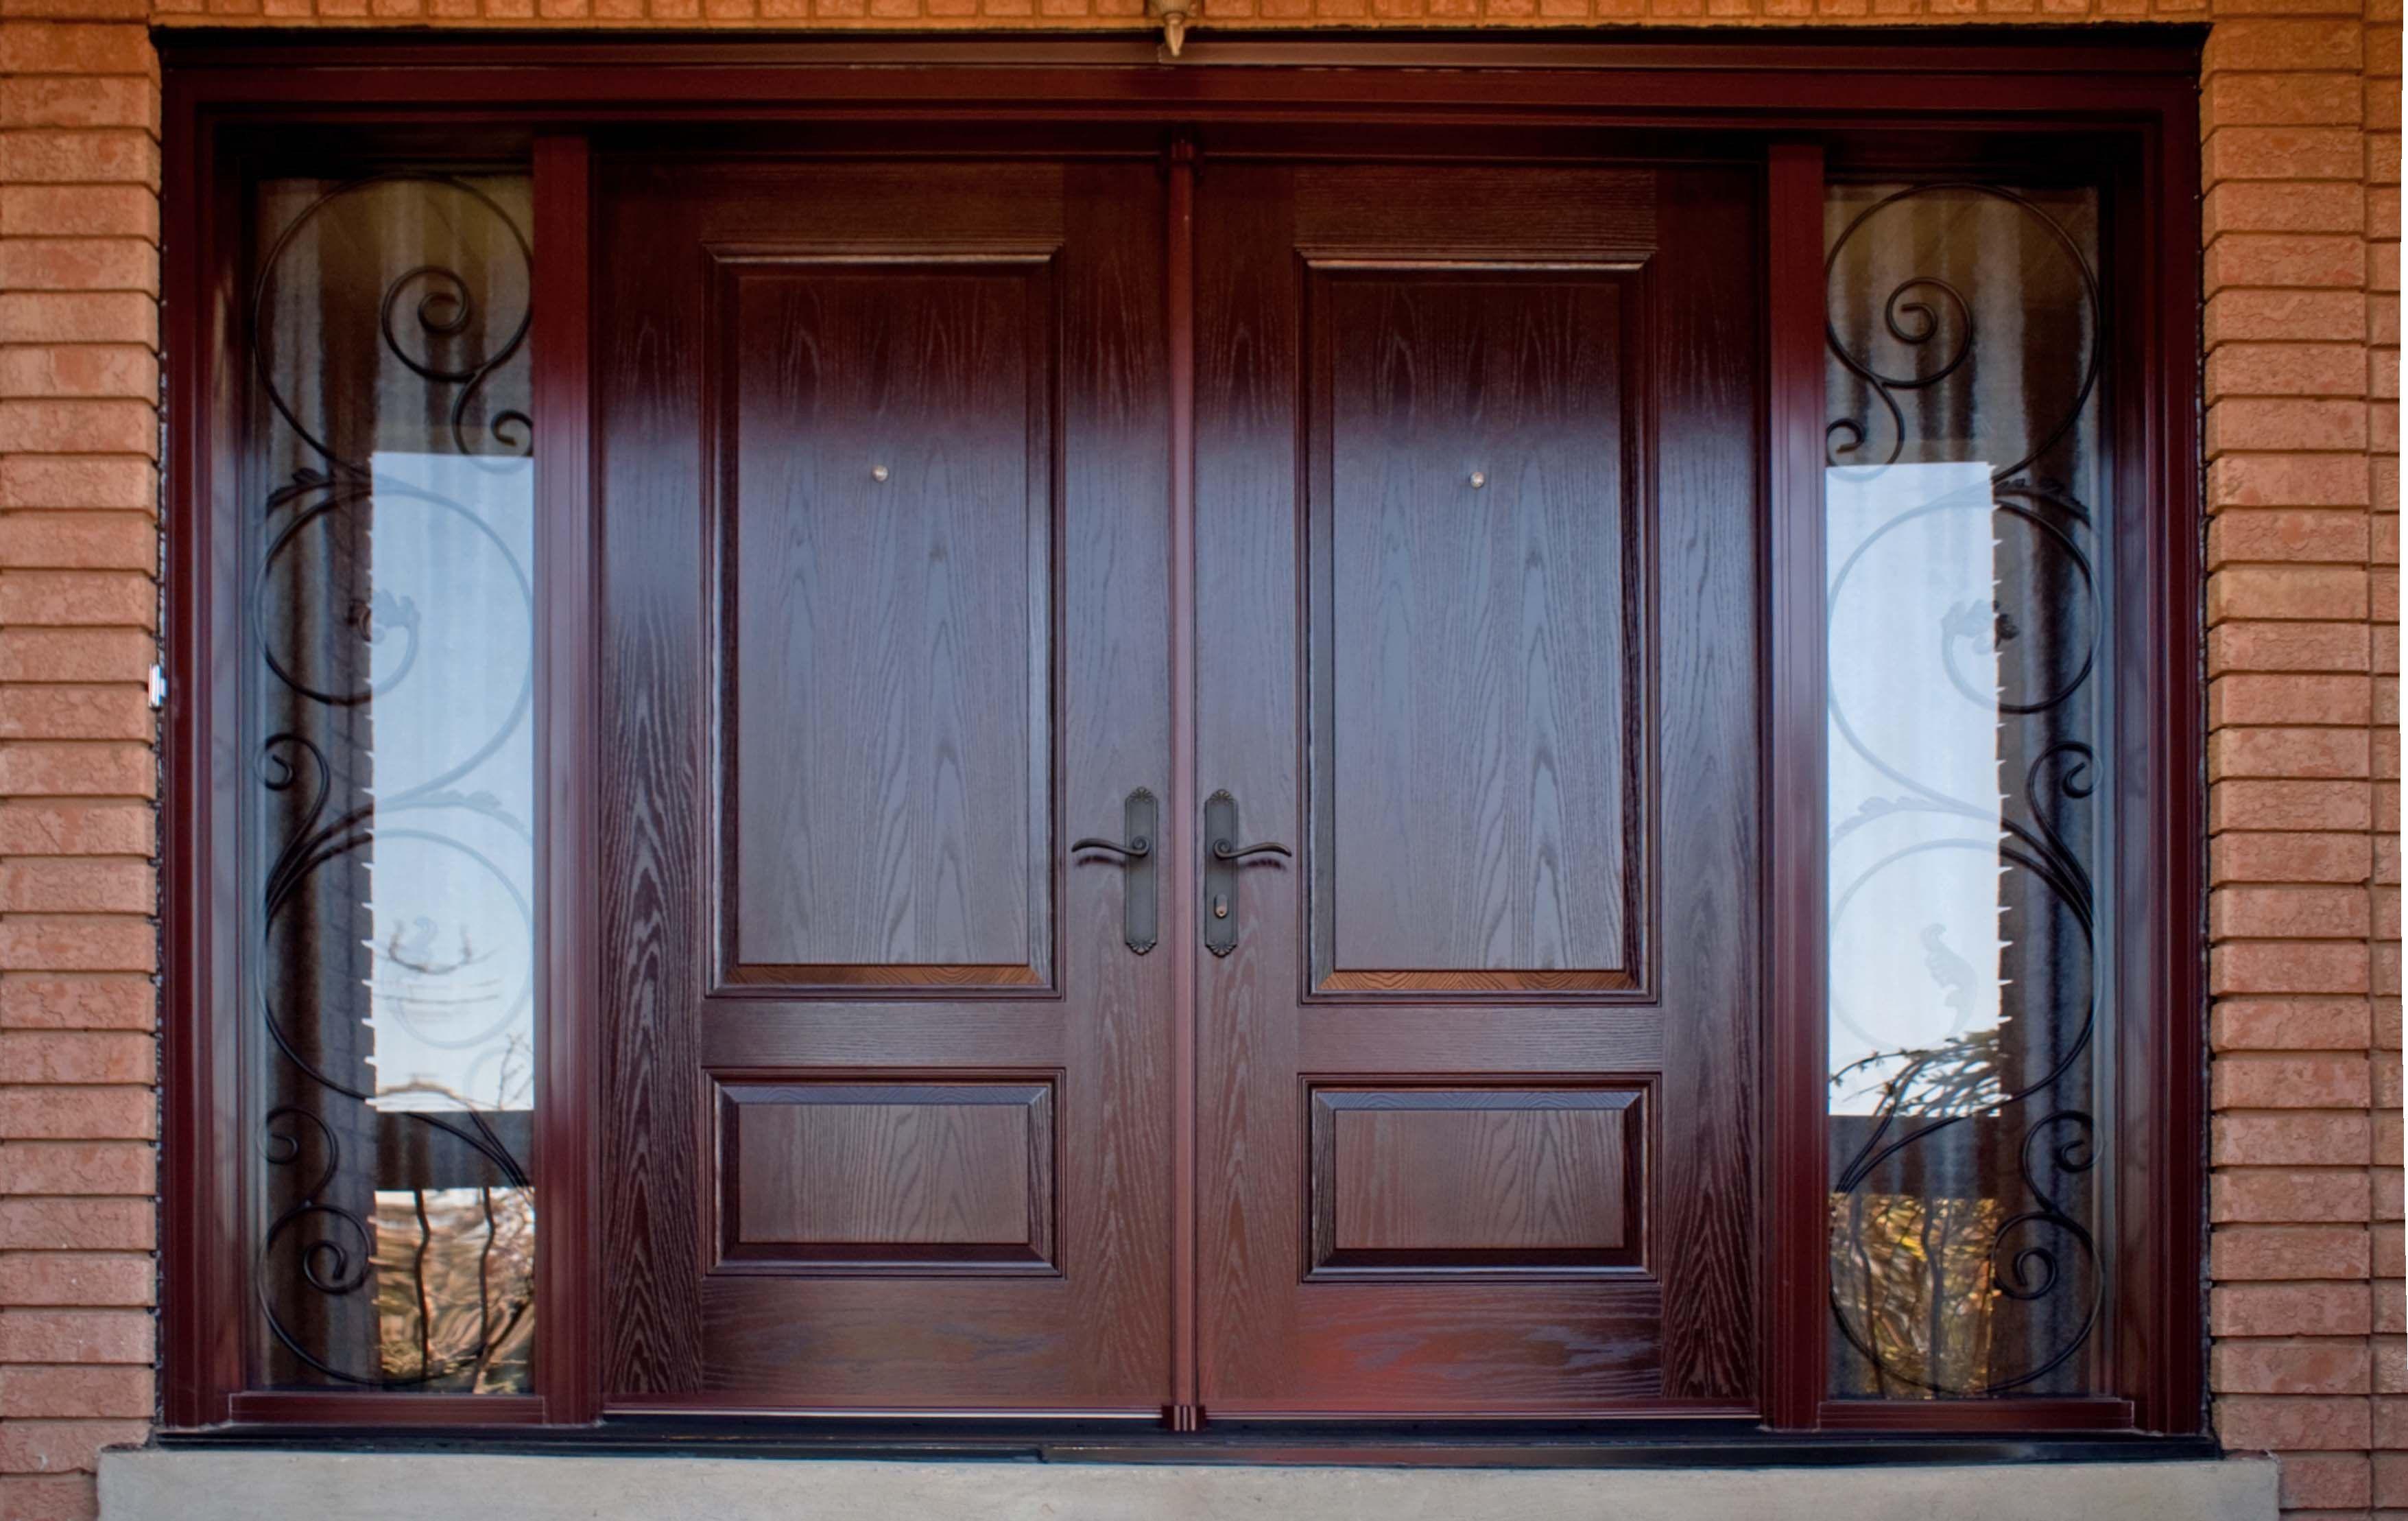 doors terrific home exterior org for sale design door handballtunisie from cheap modern reno wonderful front